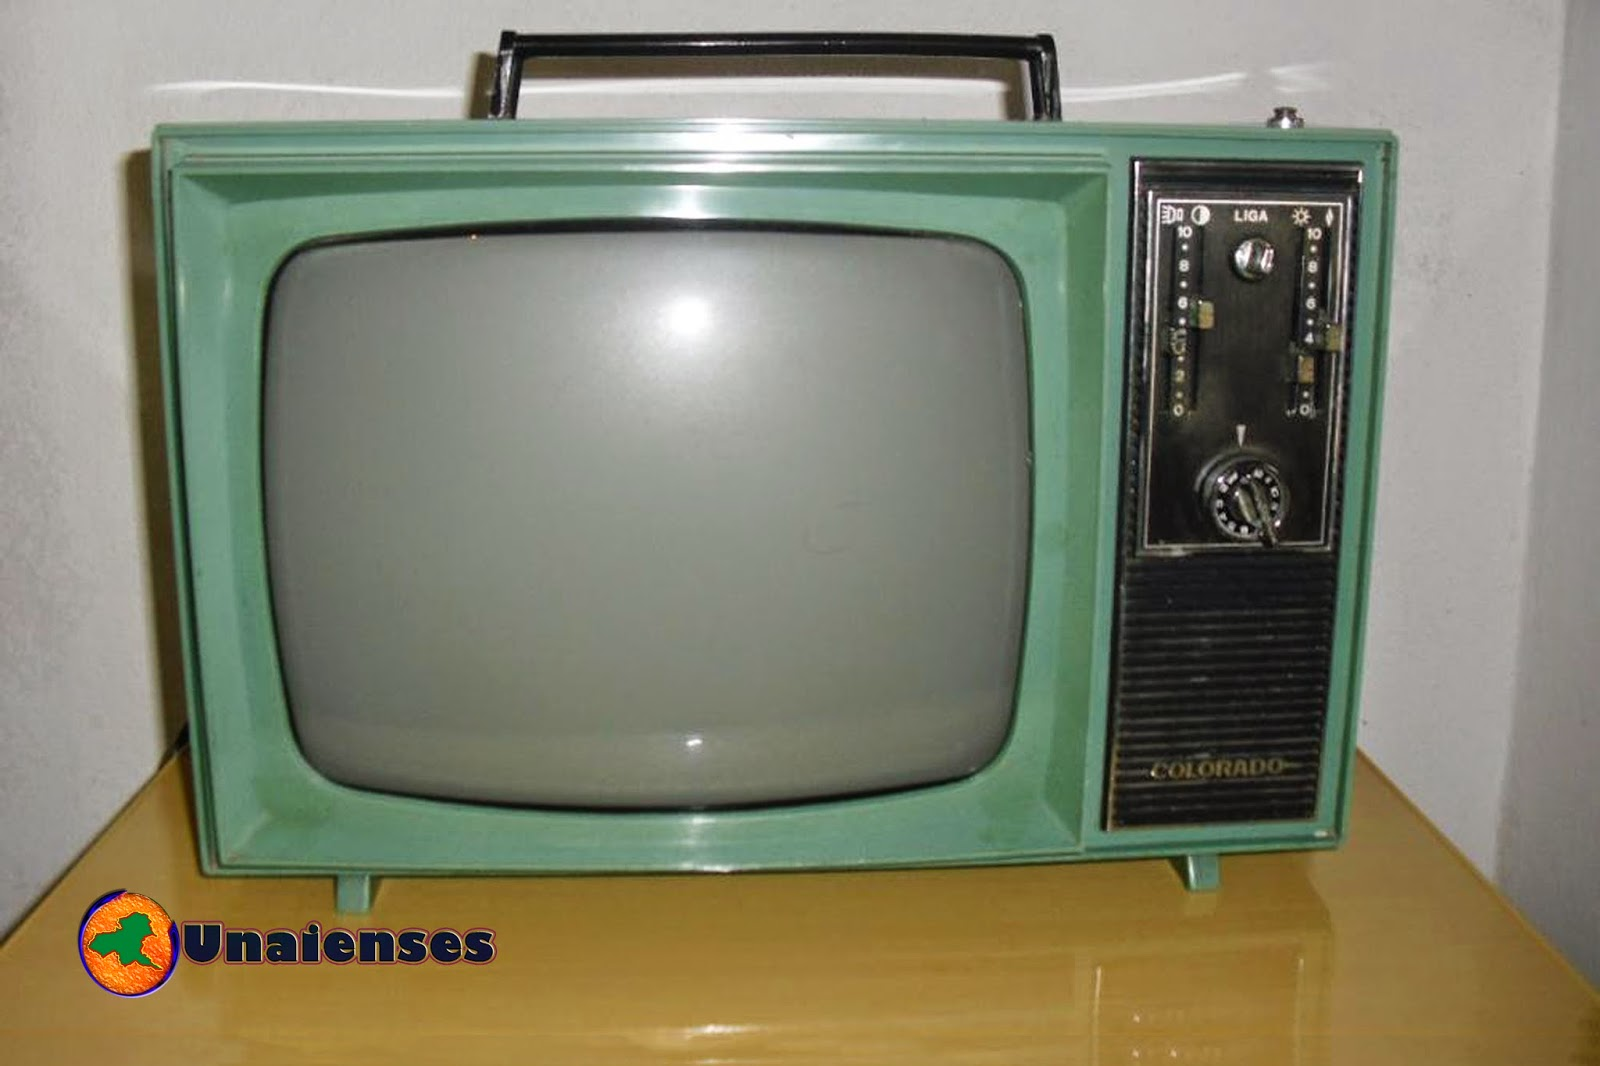 Unaienses o fim das tvs de tubo no mercado - Television anos 70 ...